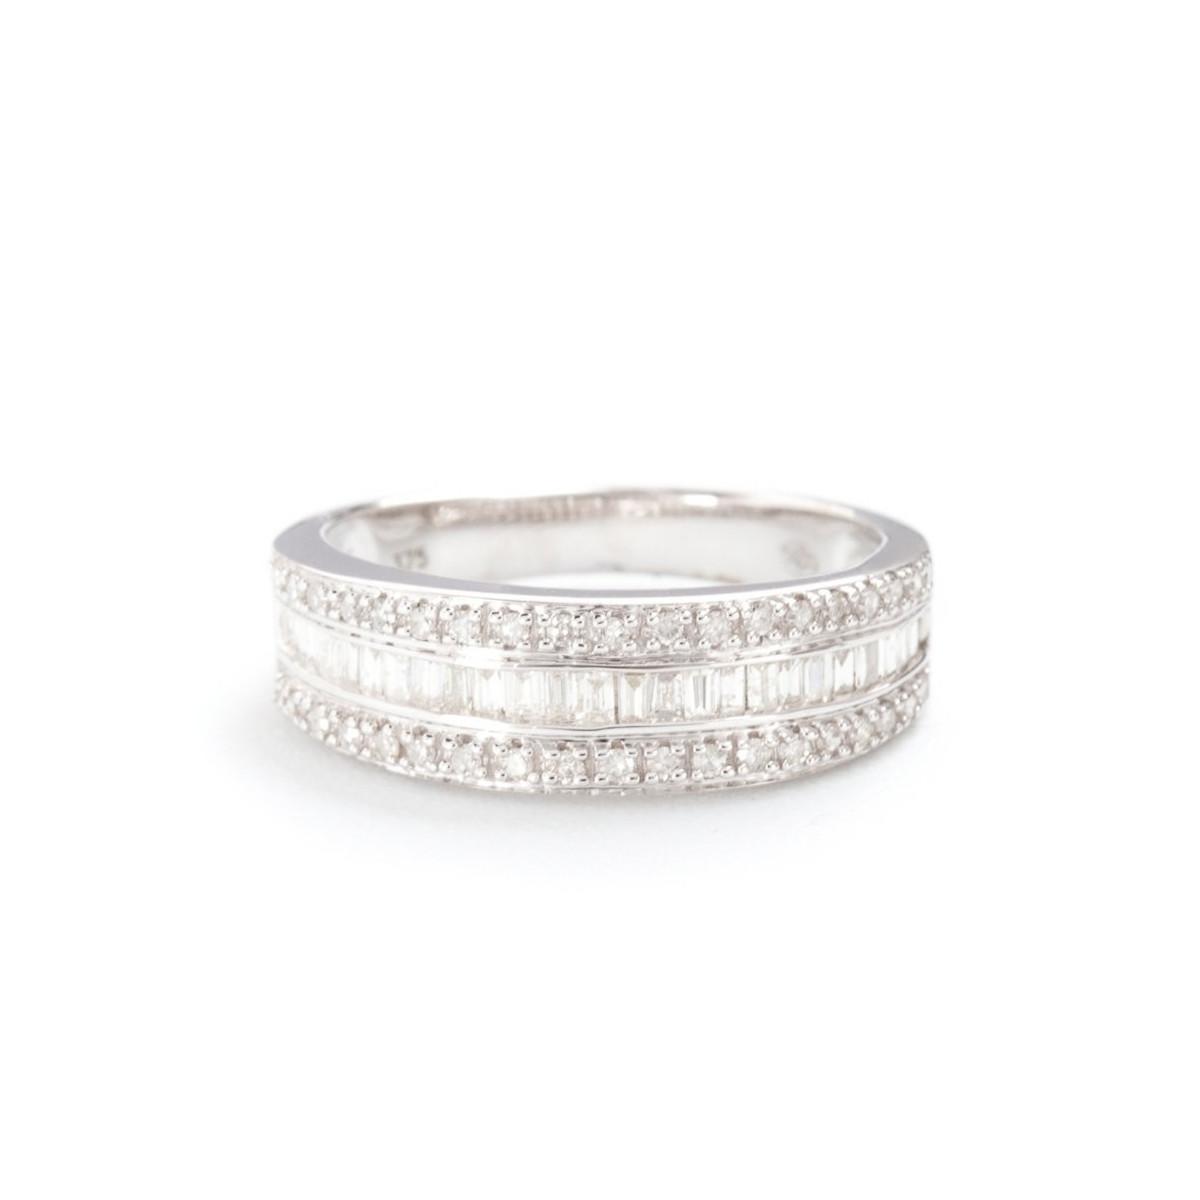 "Bague Or Blanc et Diamants 0,63 carat ""MARABELLA"""